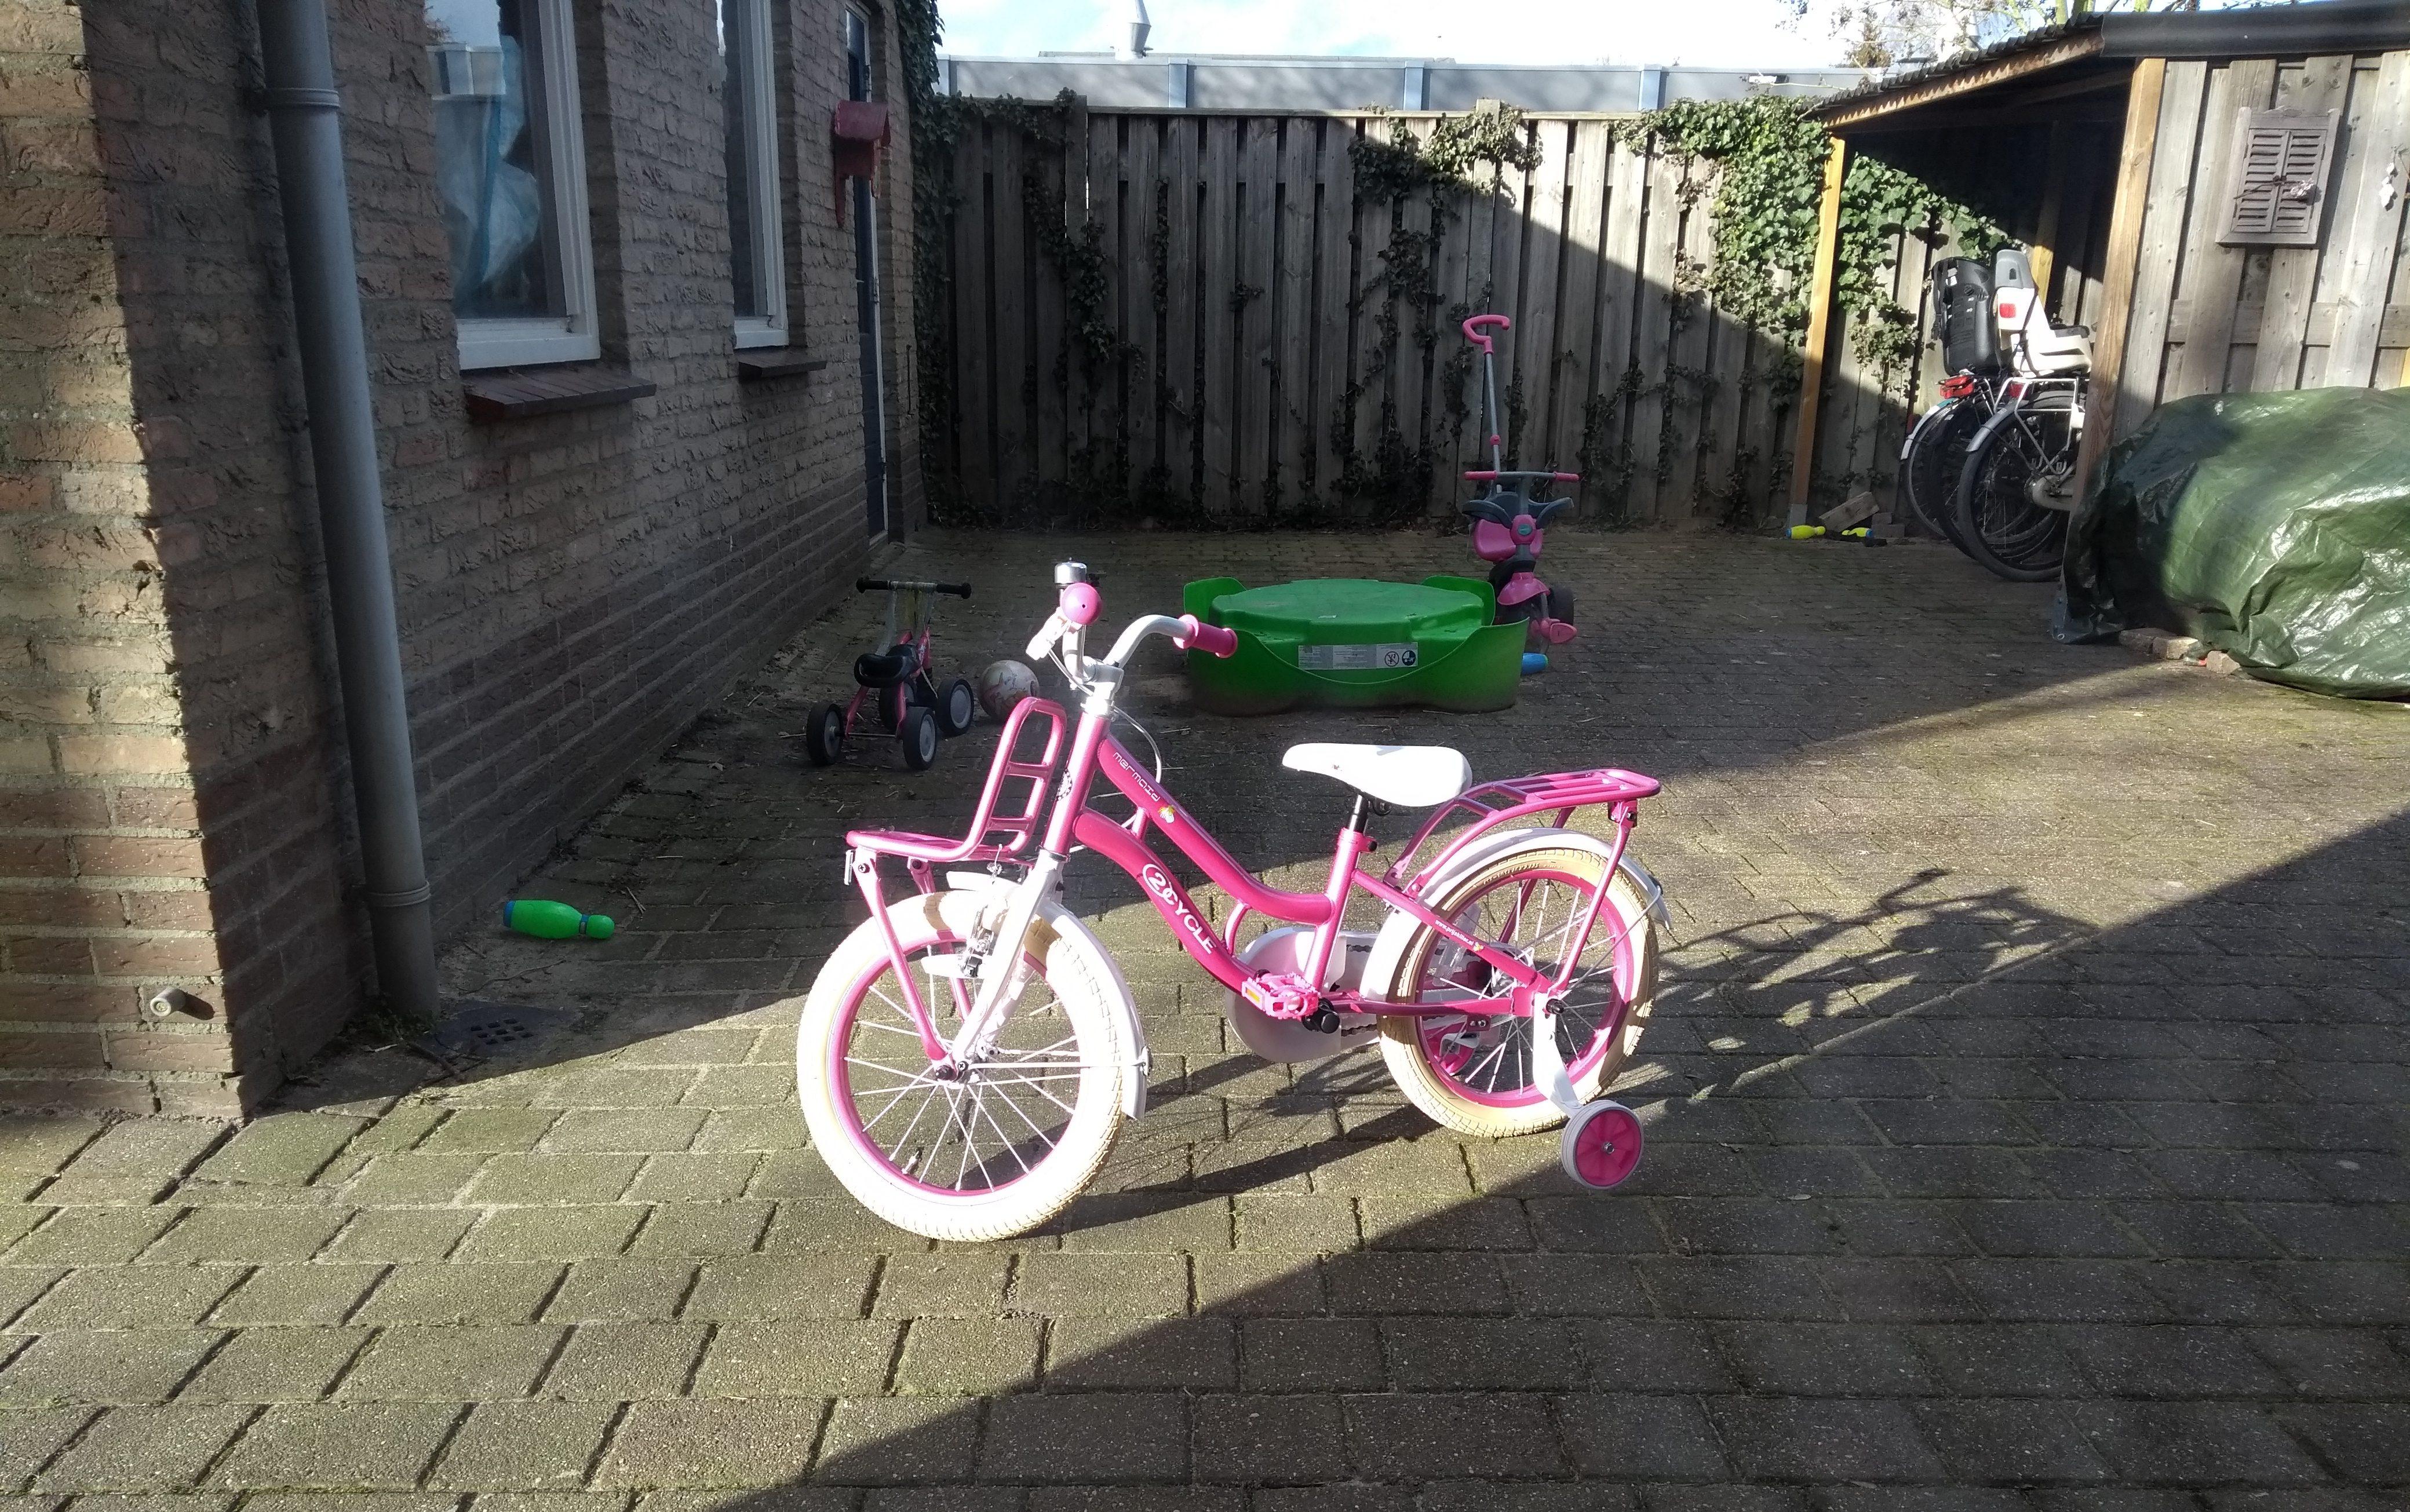 fiets, meisjesfiets, kinderfiets, kleuter, leren fietsen, zijwieltjes, kinderen, mamablog, mamalifestyleblog, gezin, roze fiets, lalogblog, lalog.nl, lalog